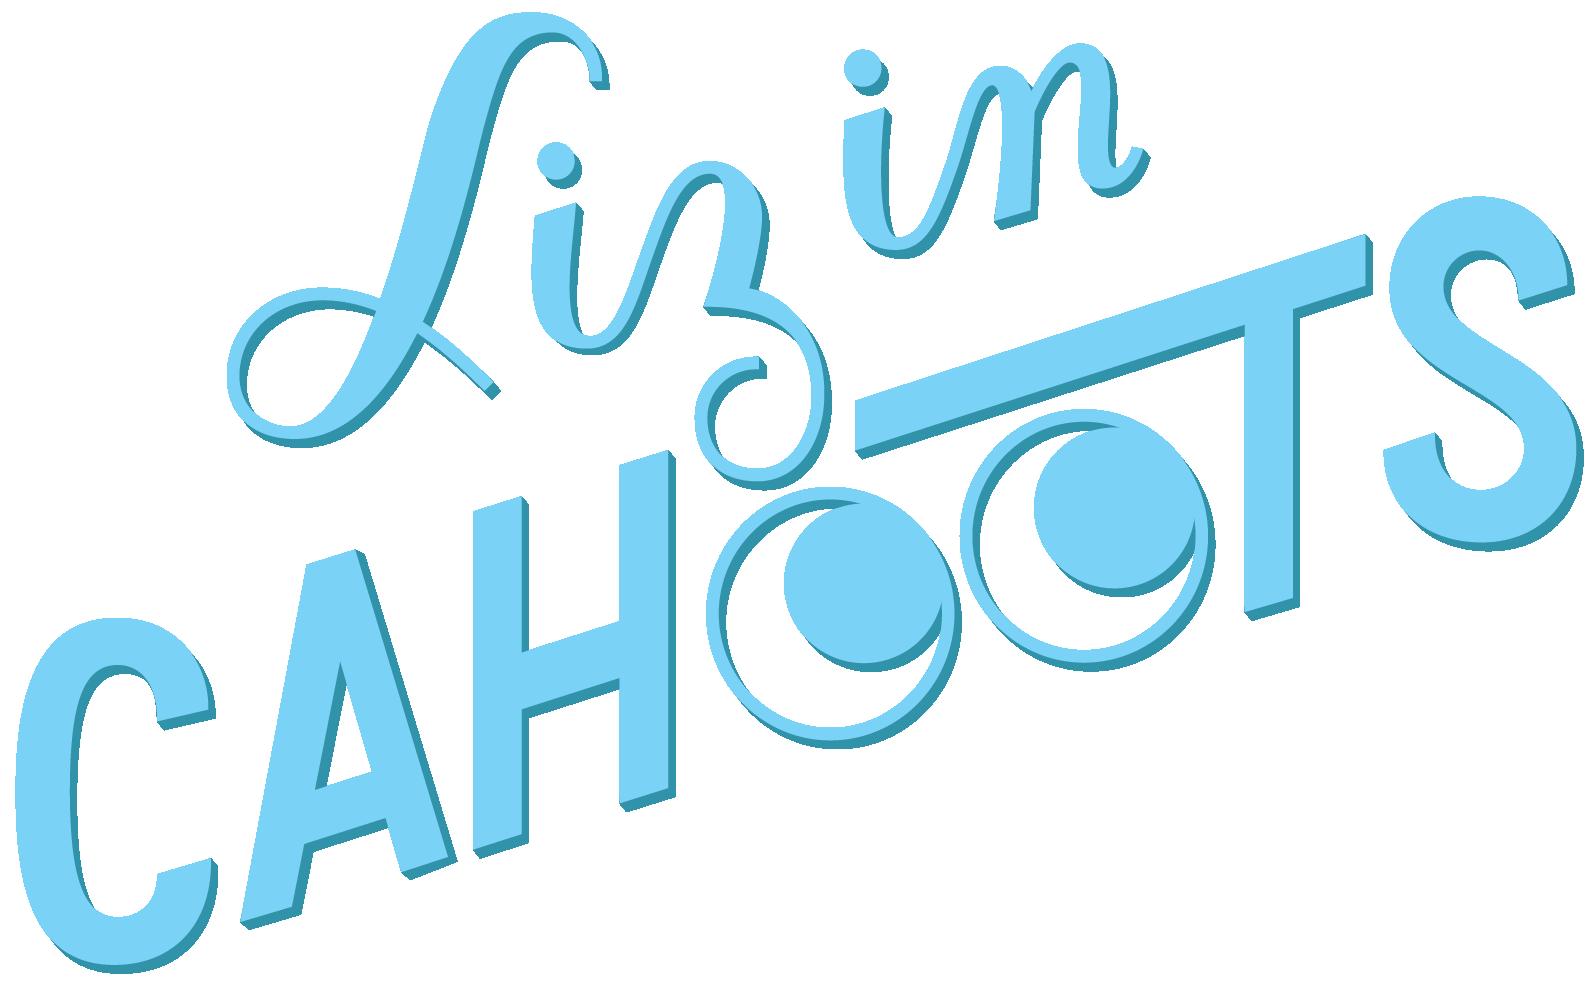 LIC_logo-03.png